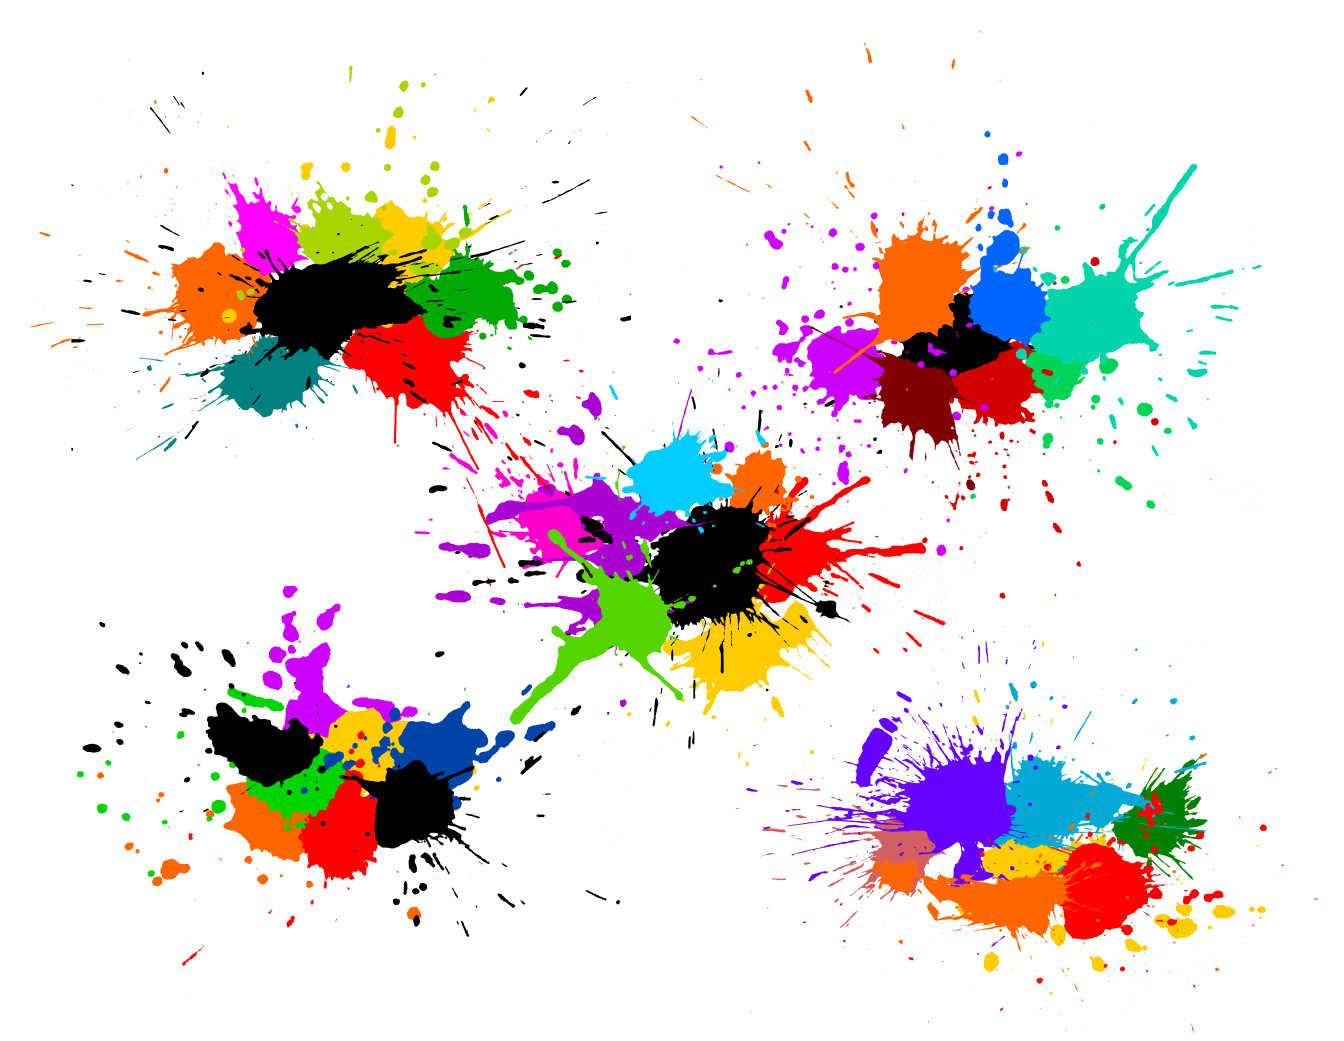 5 Colorful Paint Splash Background Vector (SVG)   OnlyGFX com